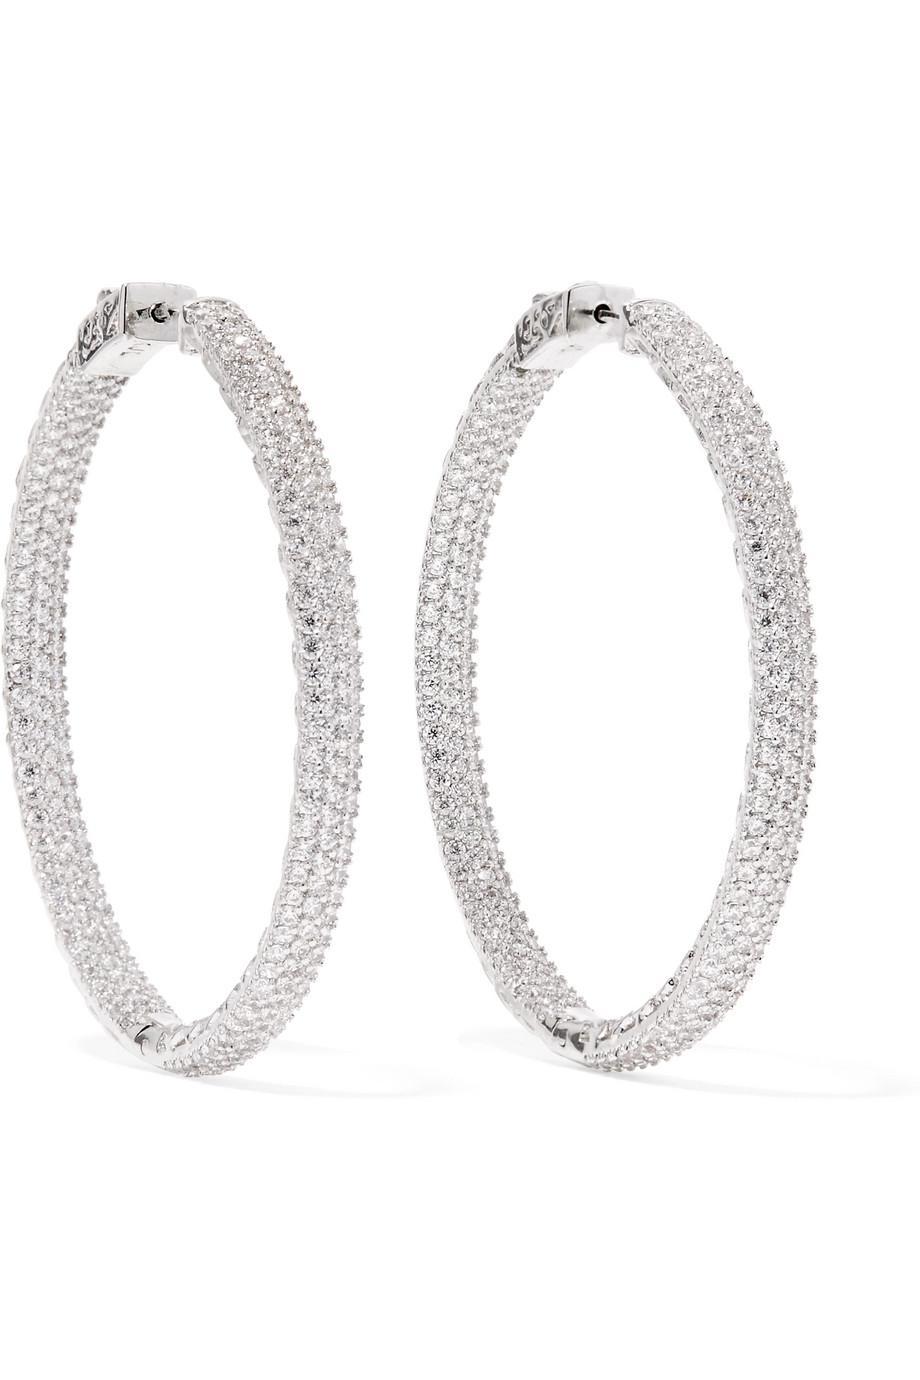 Kenneth Jay Lane Rhodium-plated Crystal Hoop Earrings - Silver nwfpRq3k